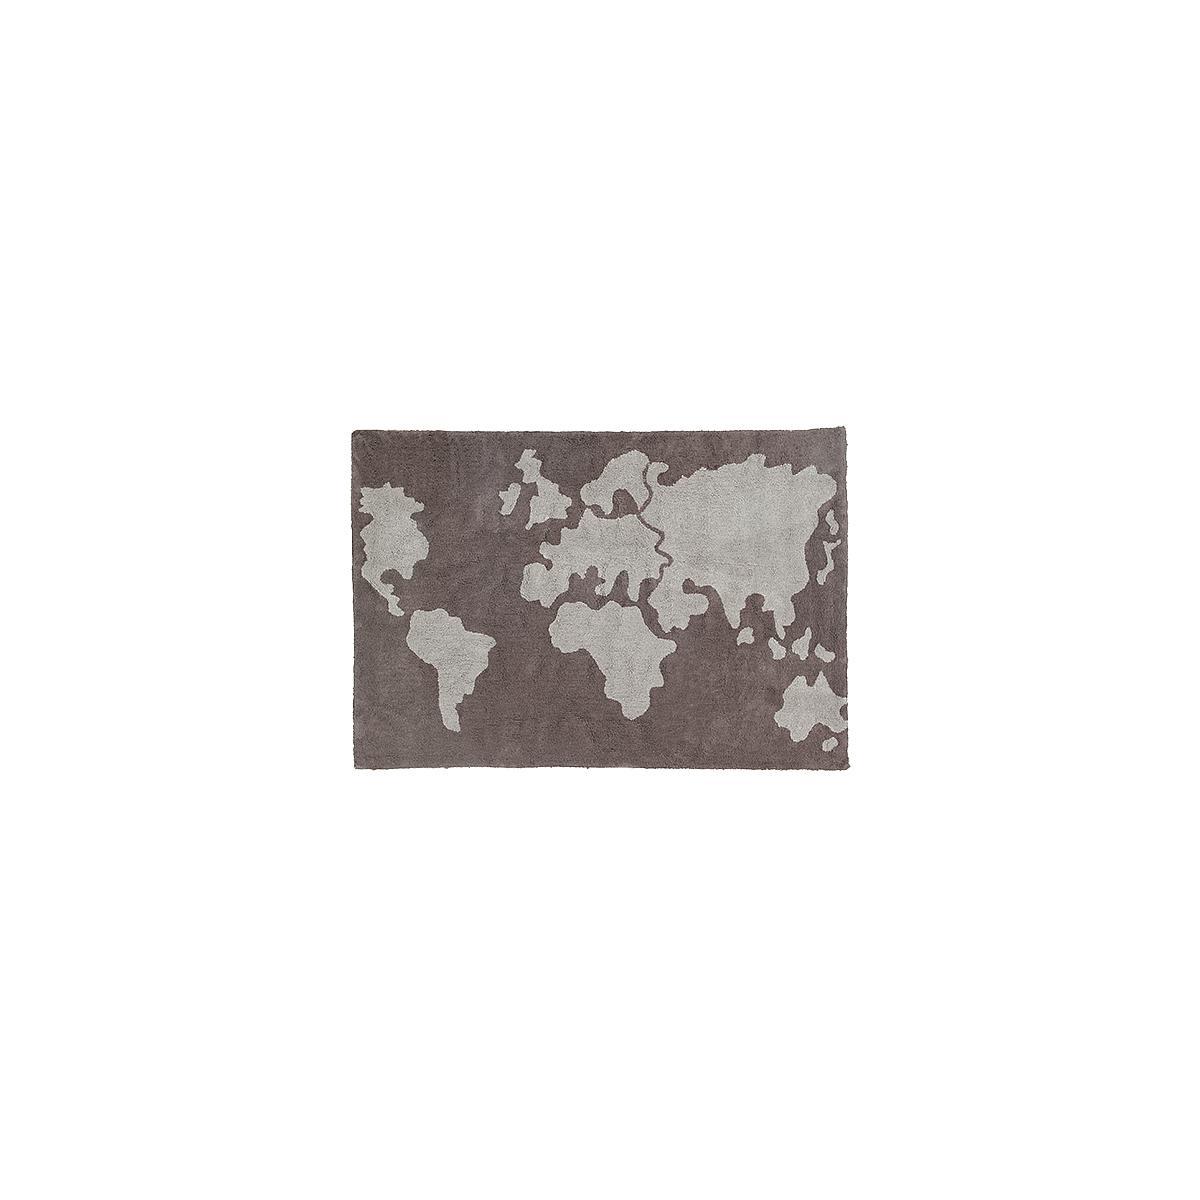 Tapis 140x200 cm WORLD MAP Lorena Canals